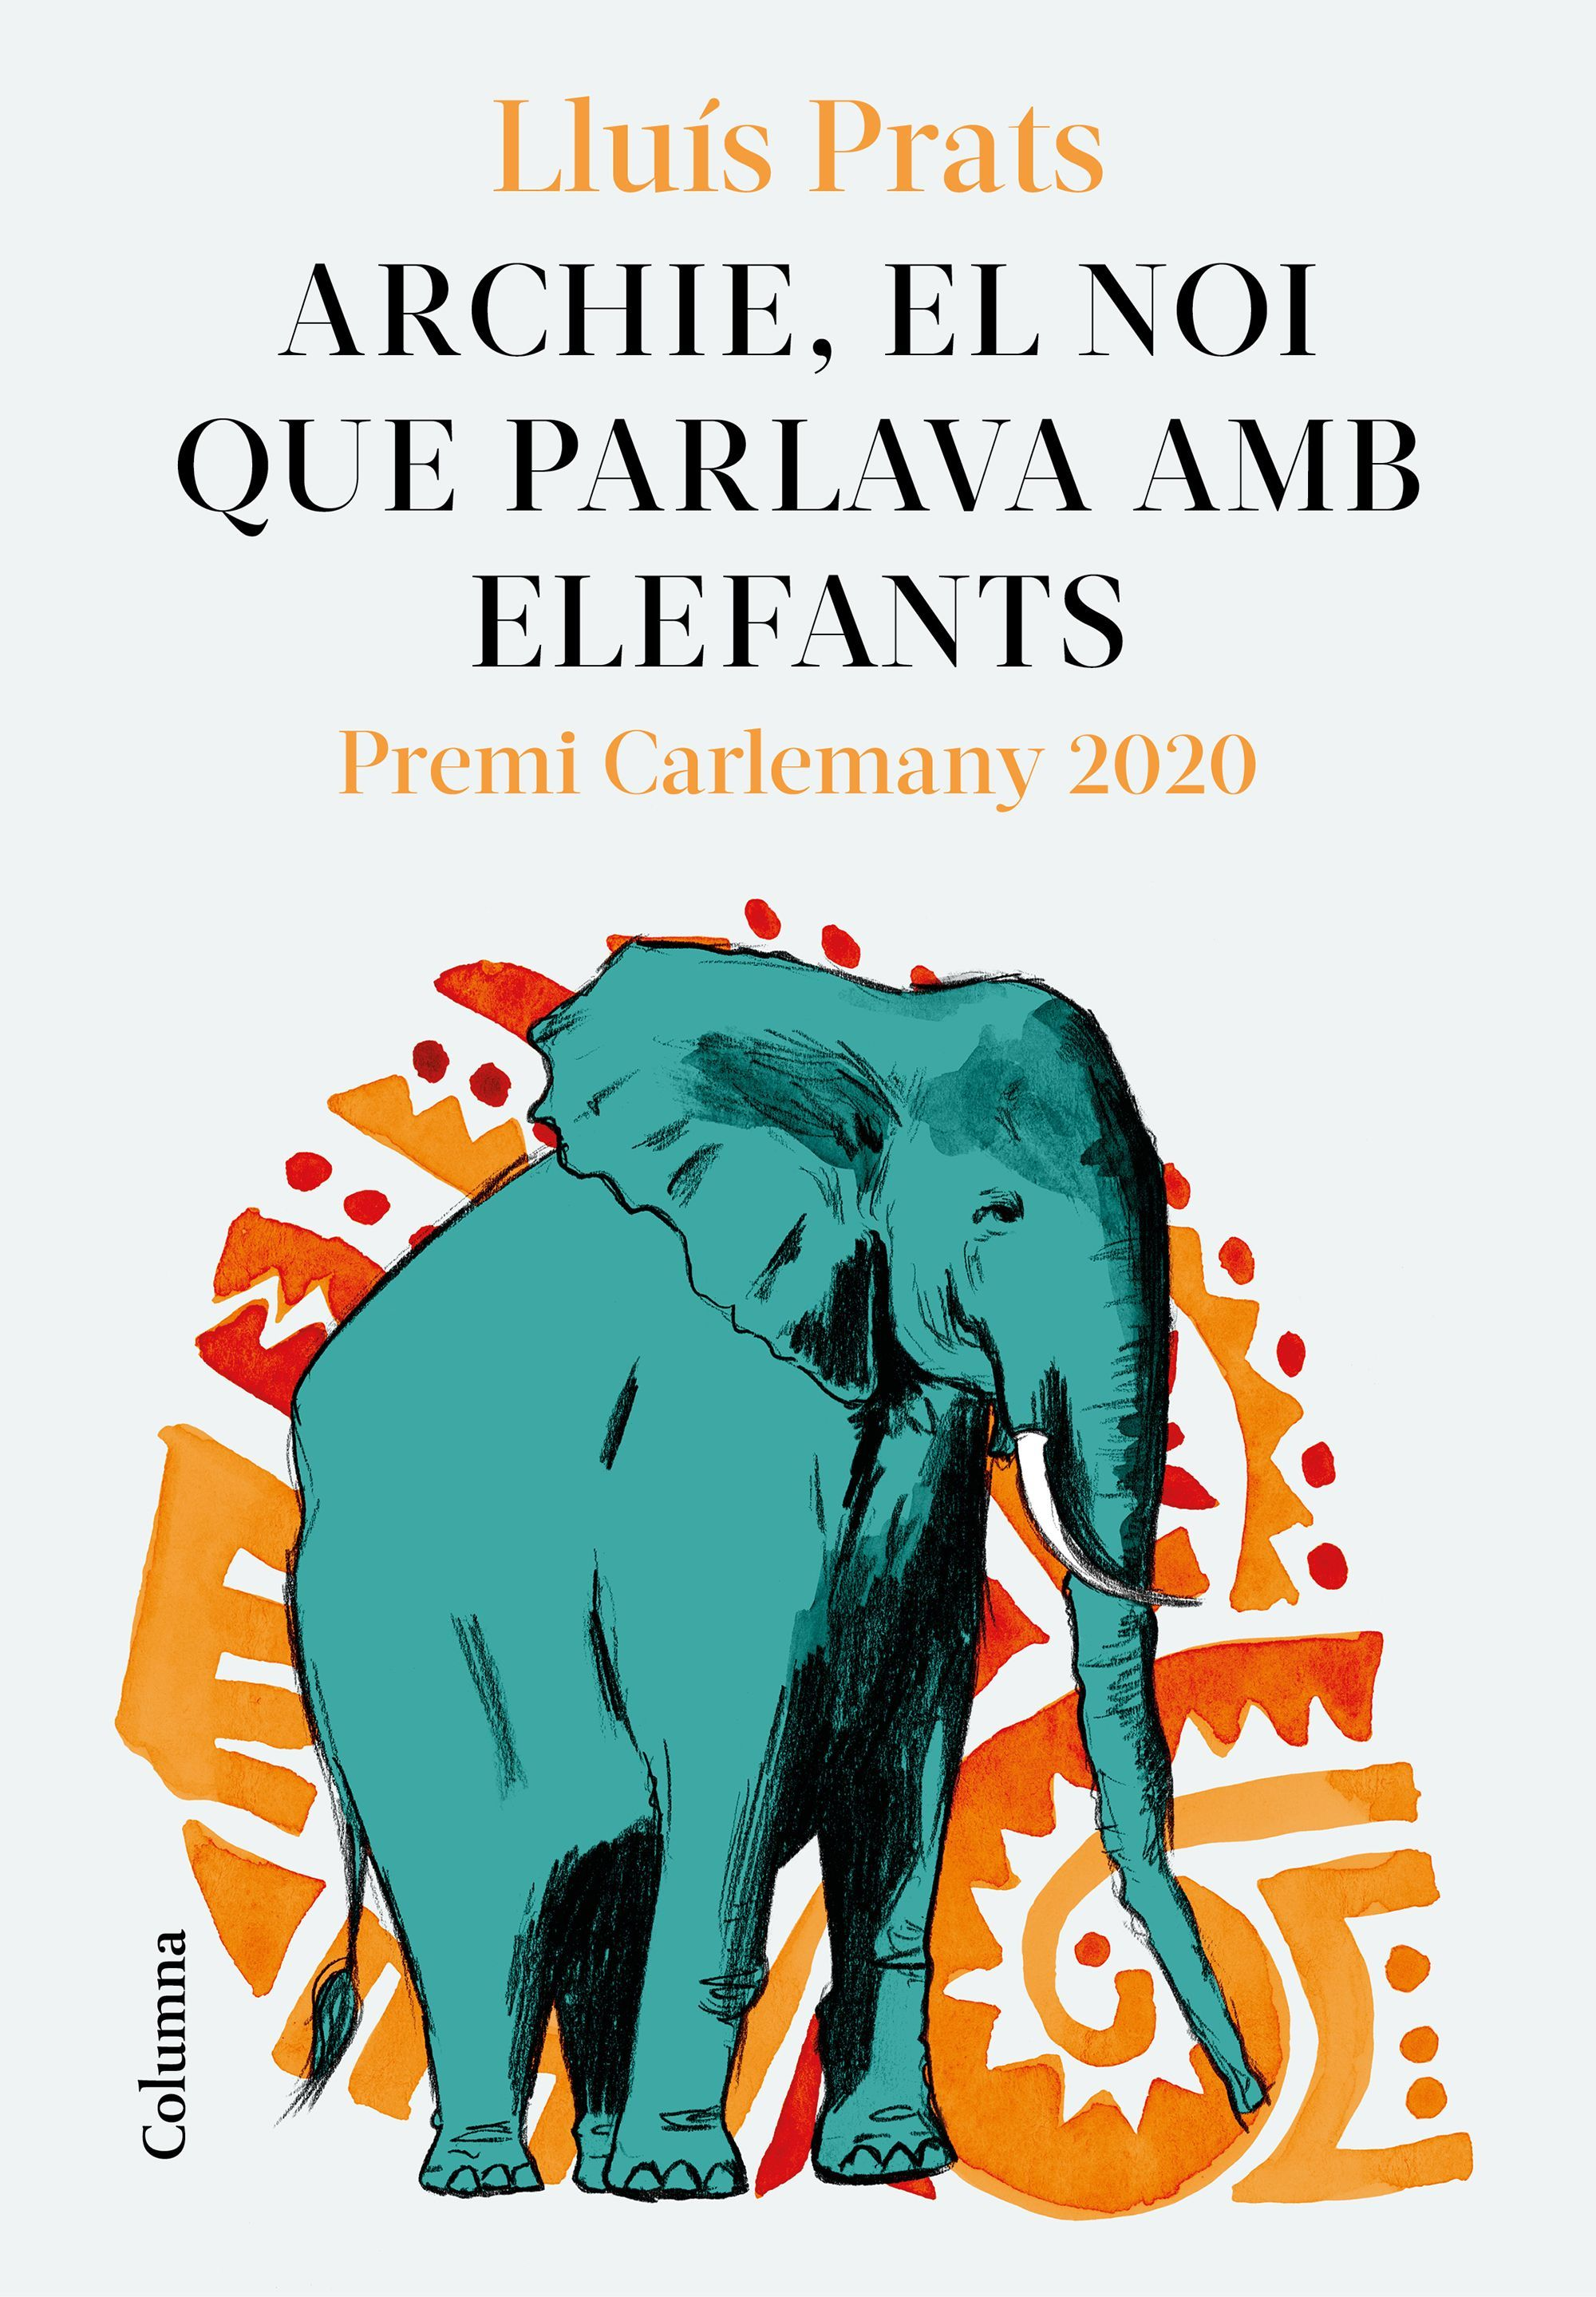 ARCHIE EL NOI QUE PARLAVA AMB ELEFANTS